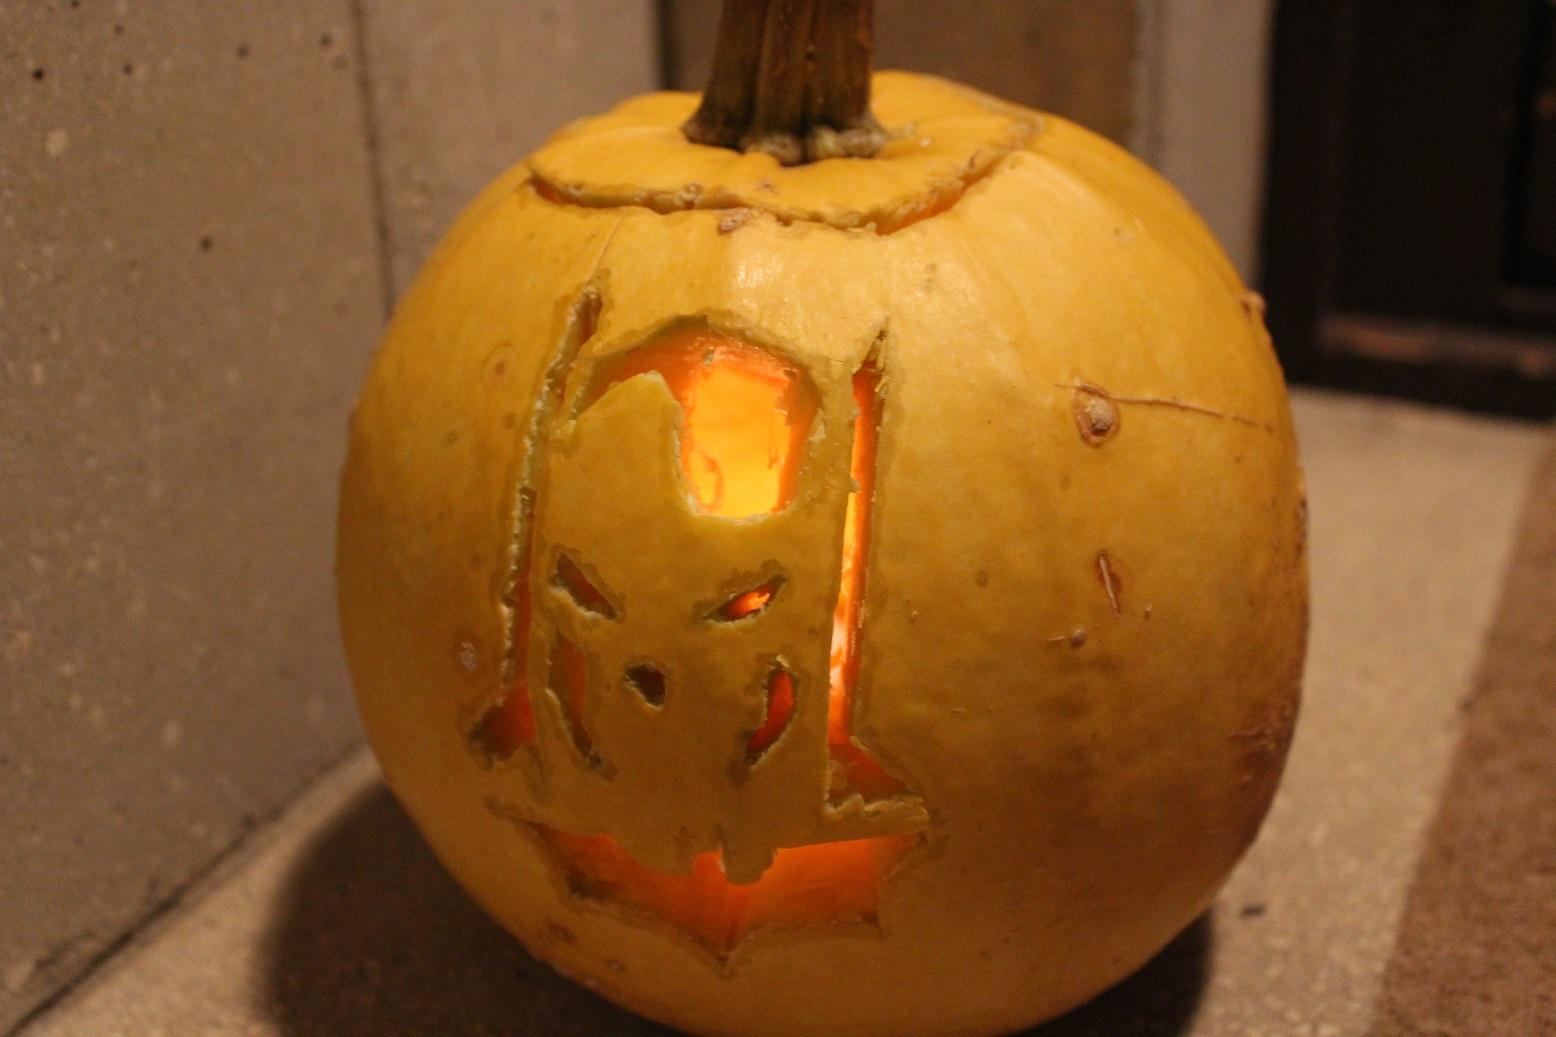 szmk_tok_pumpkin_boba_fett_star_wars_23.JPG